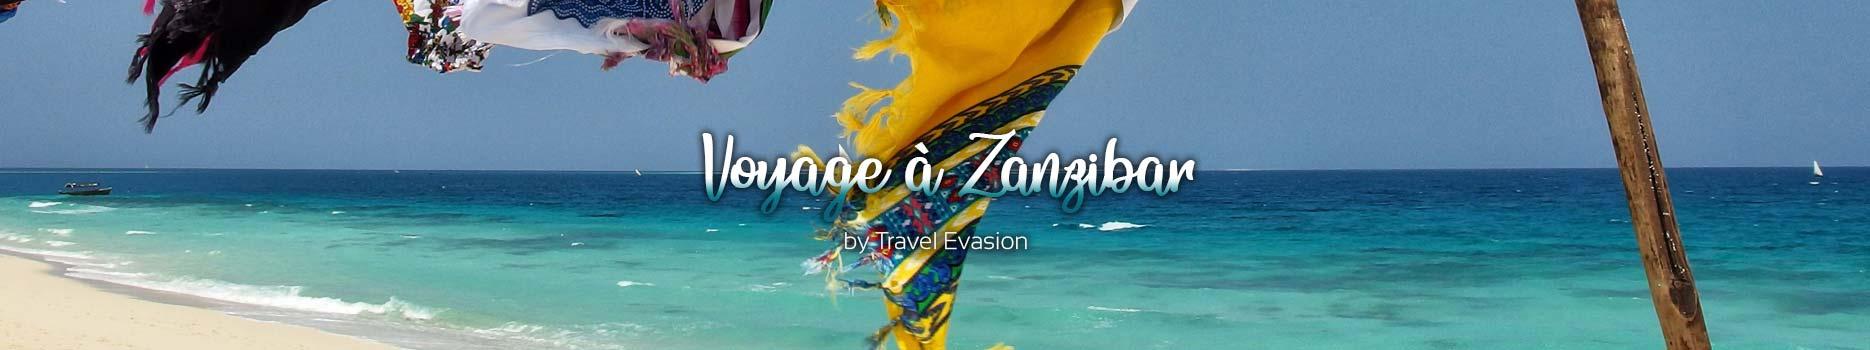 Séjour à Zanzibar ses Ies et Unguja en Tanzanie